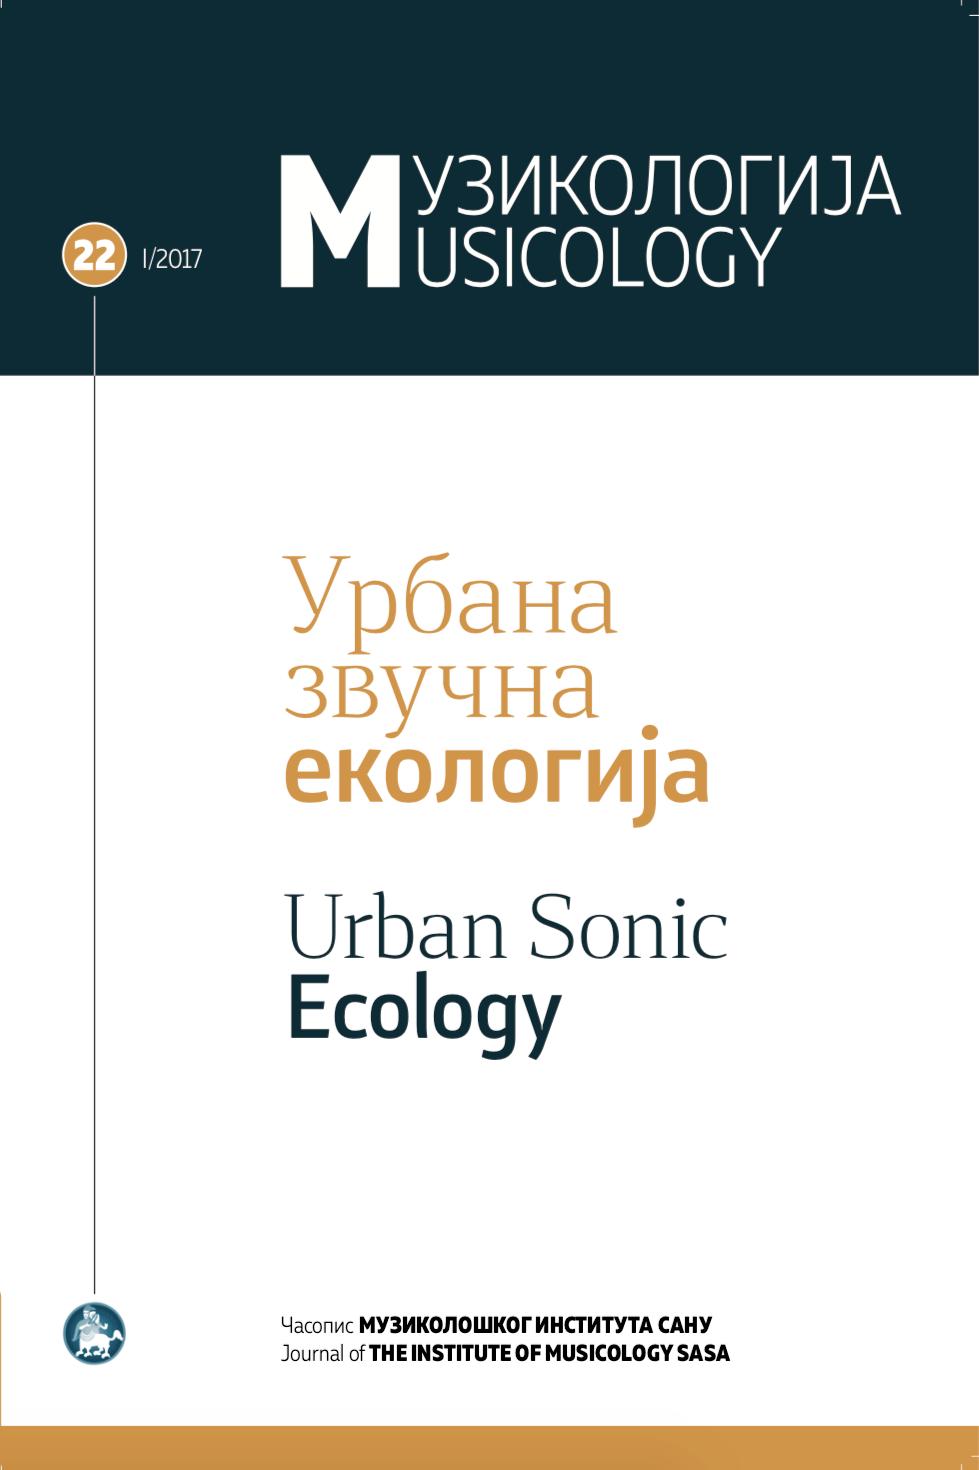 Musicology 22